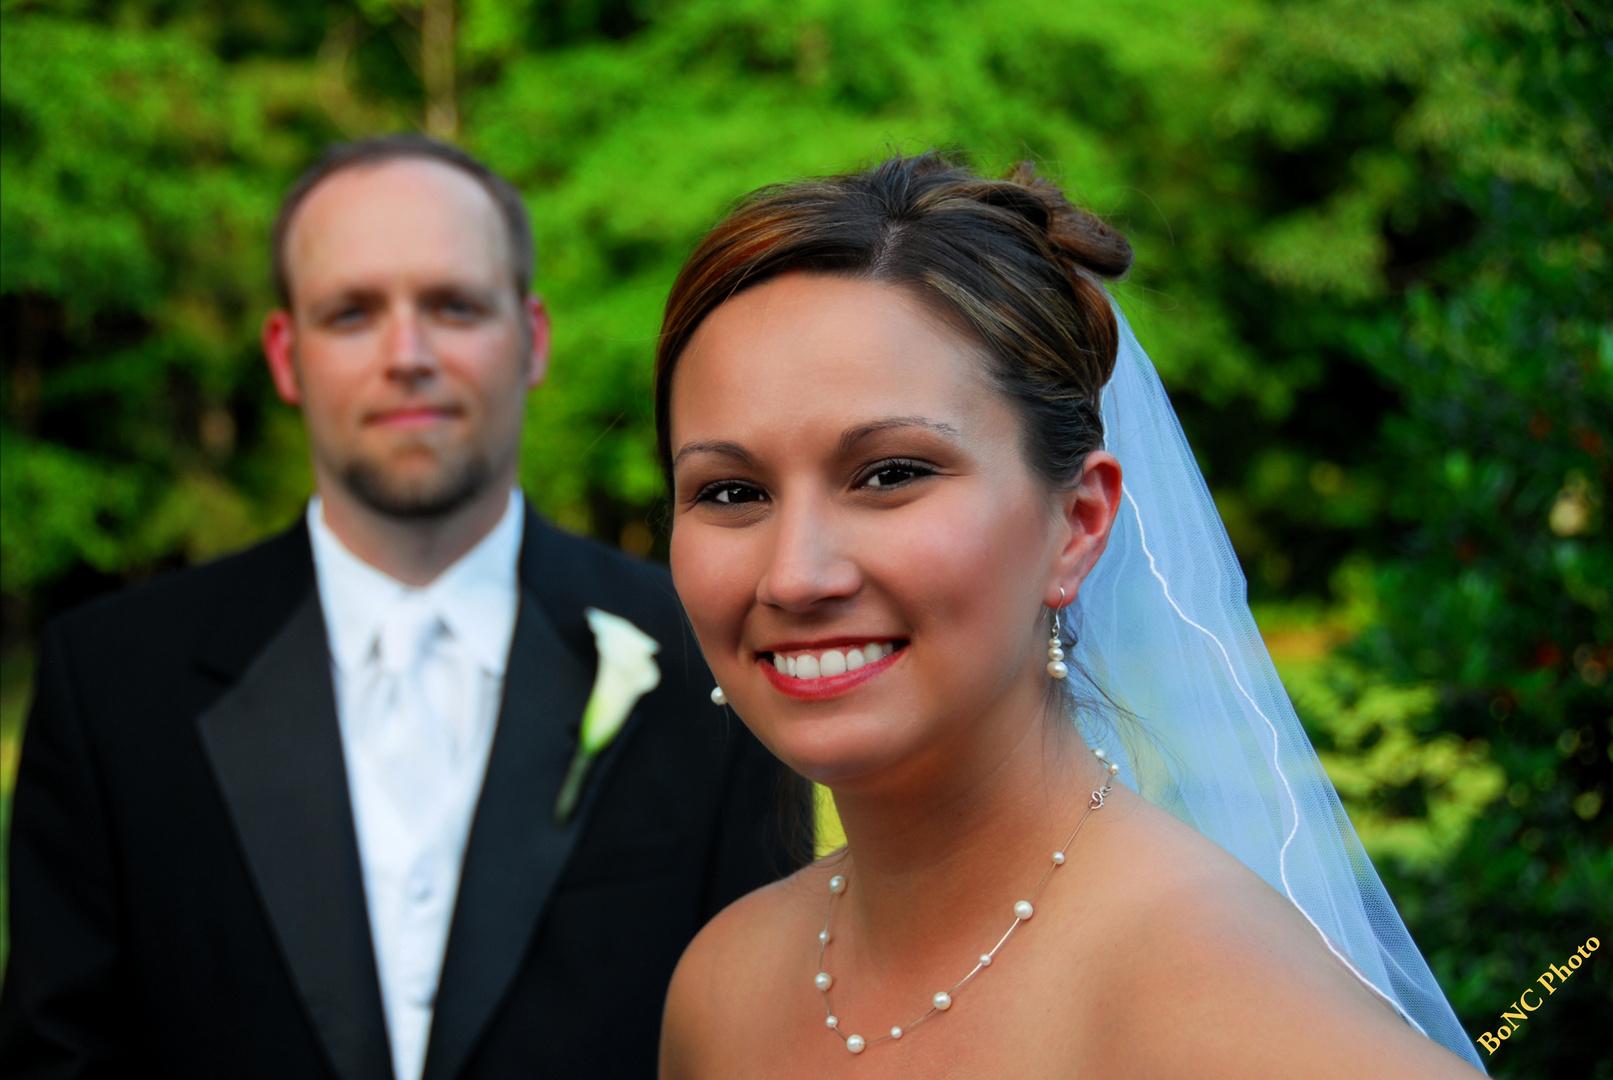 Wedding in NC USA